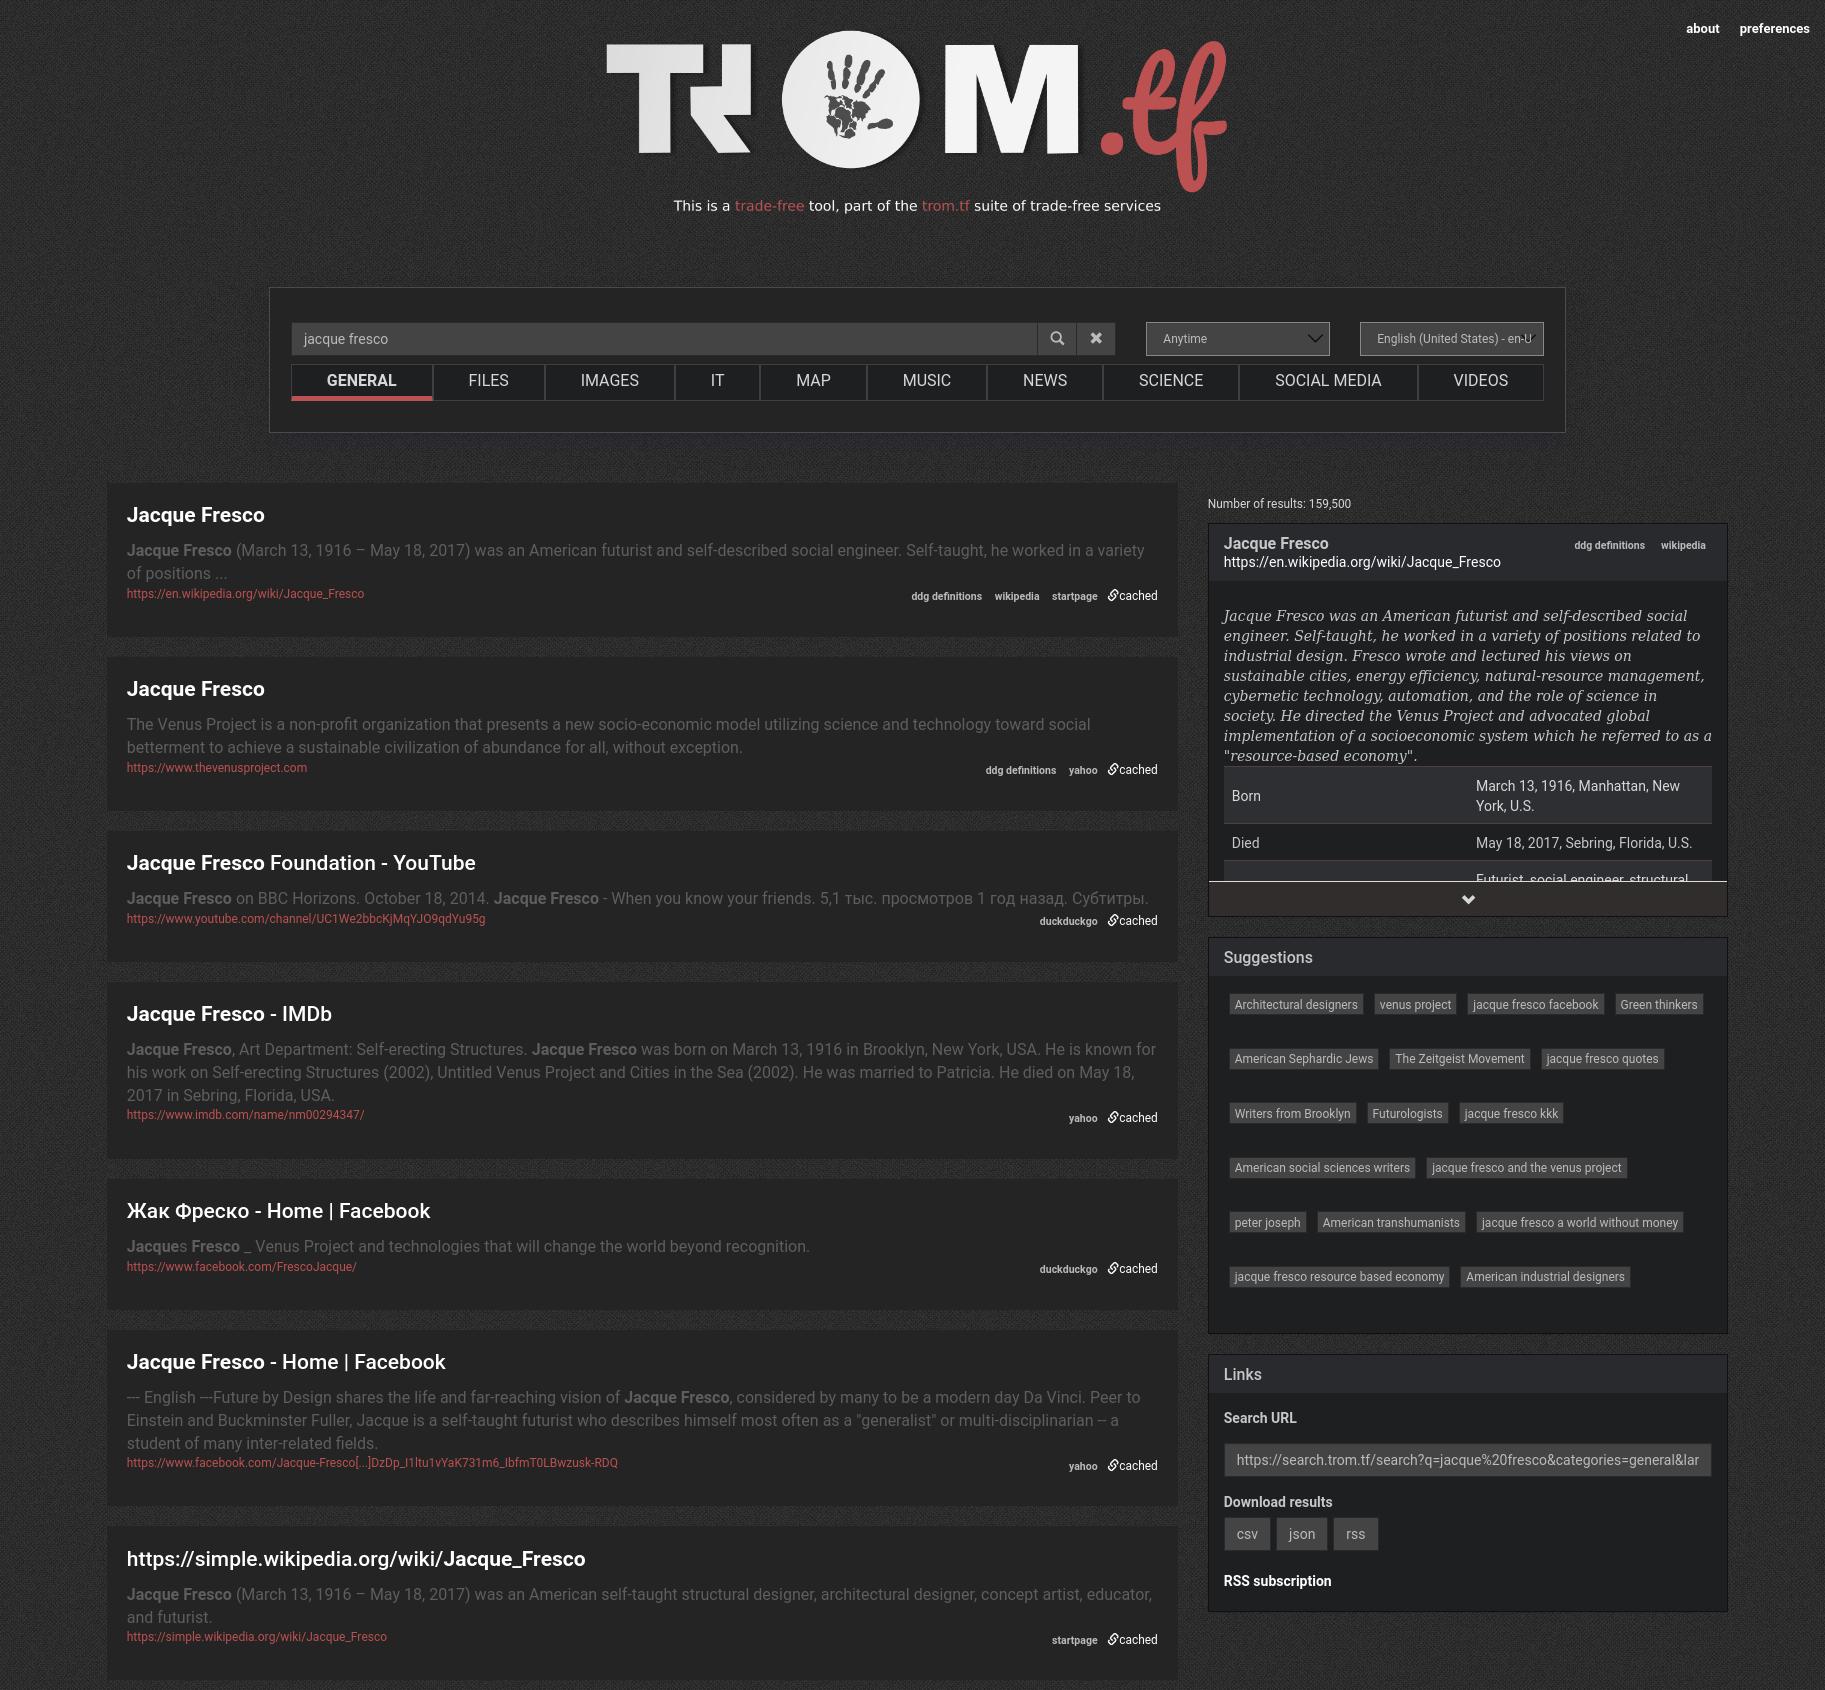 Screenshot_2021-03-08 jacque fresco - search trom tf